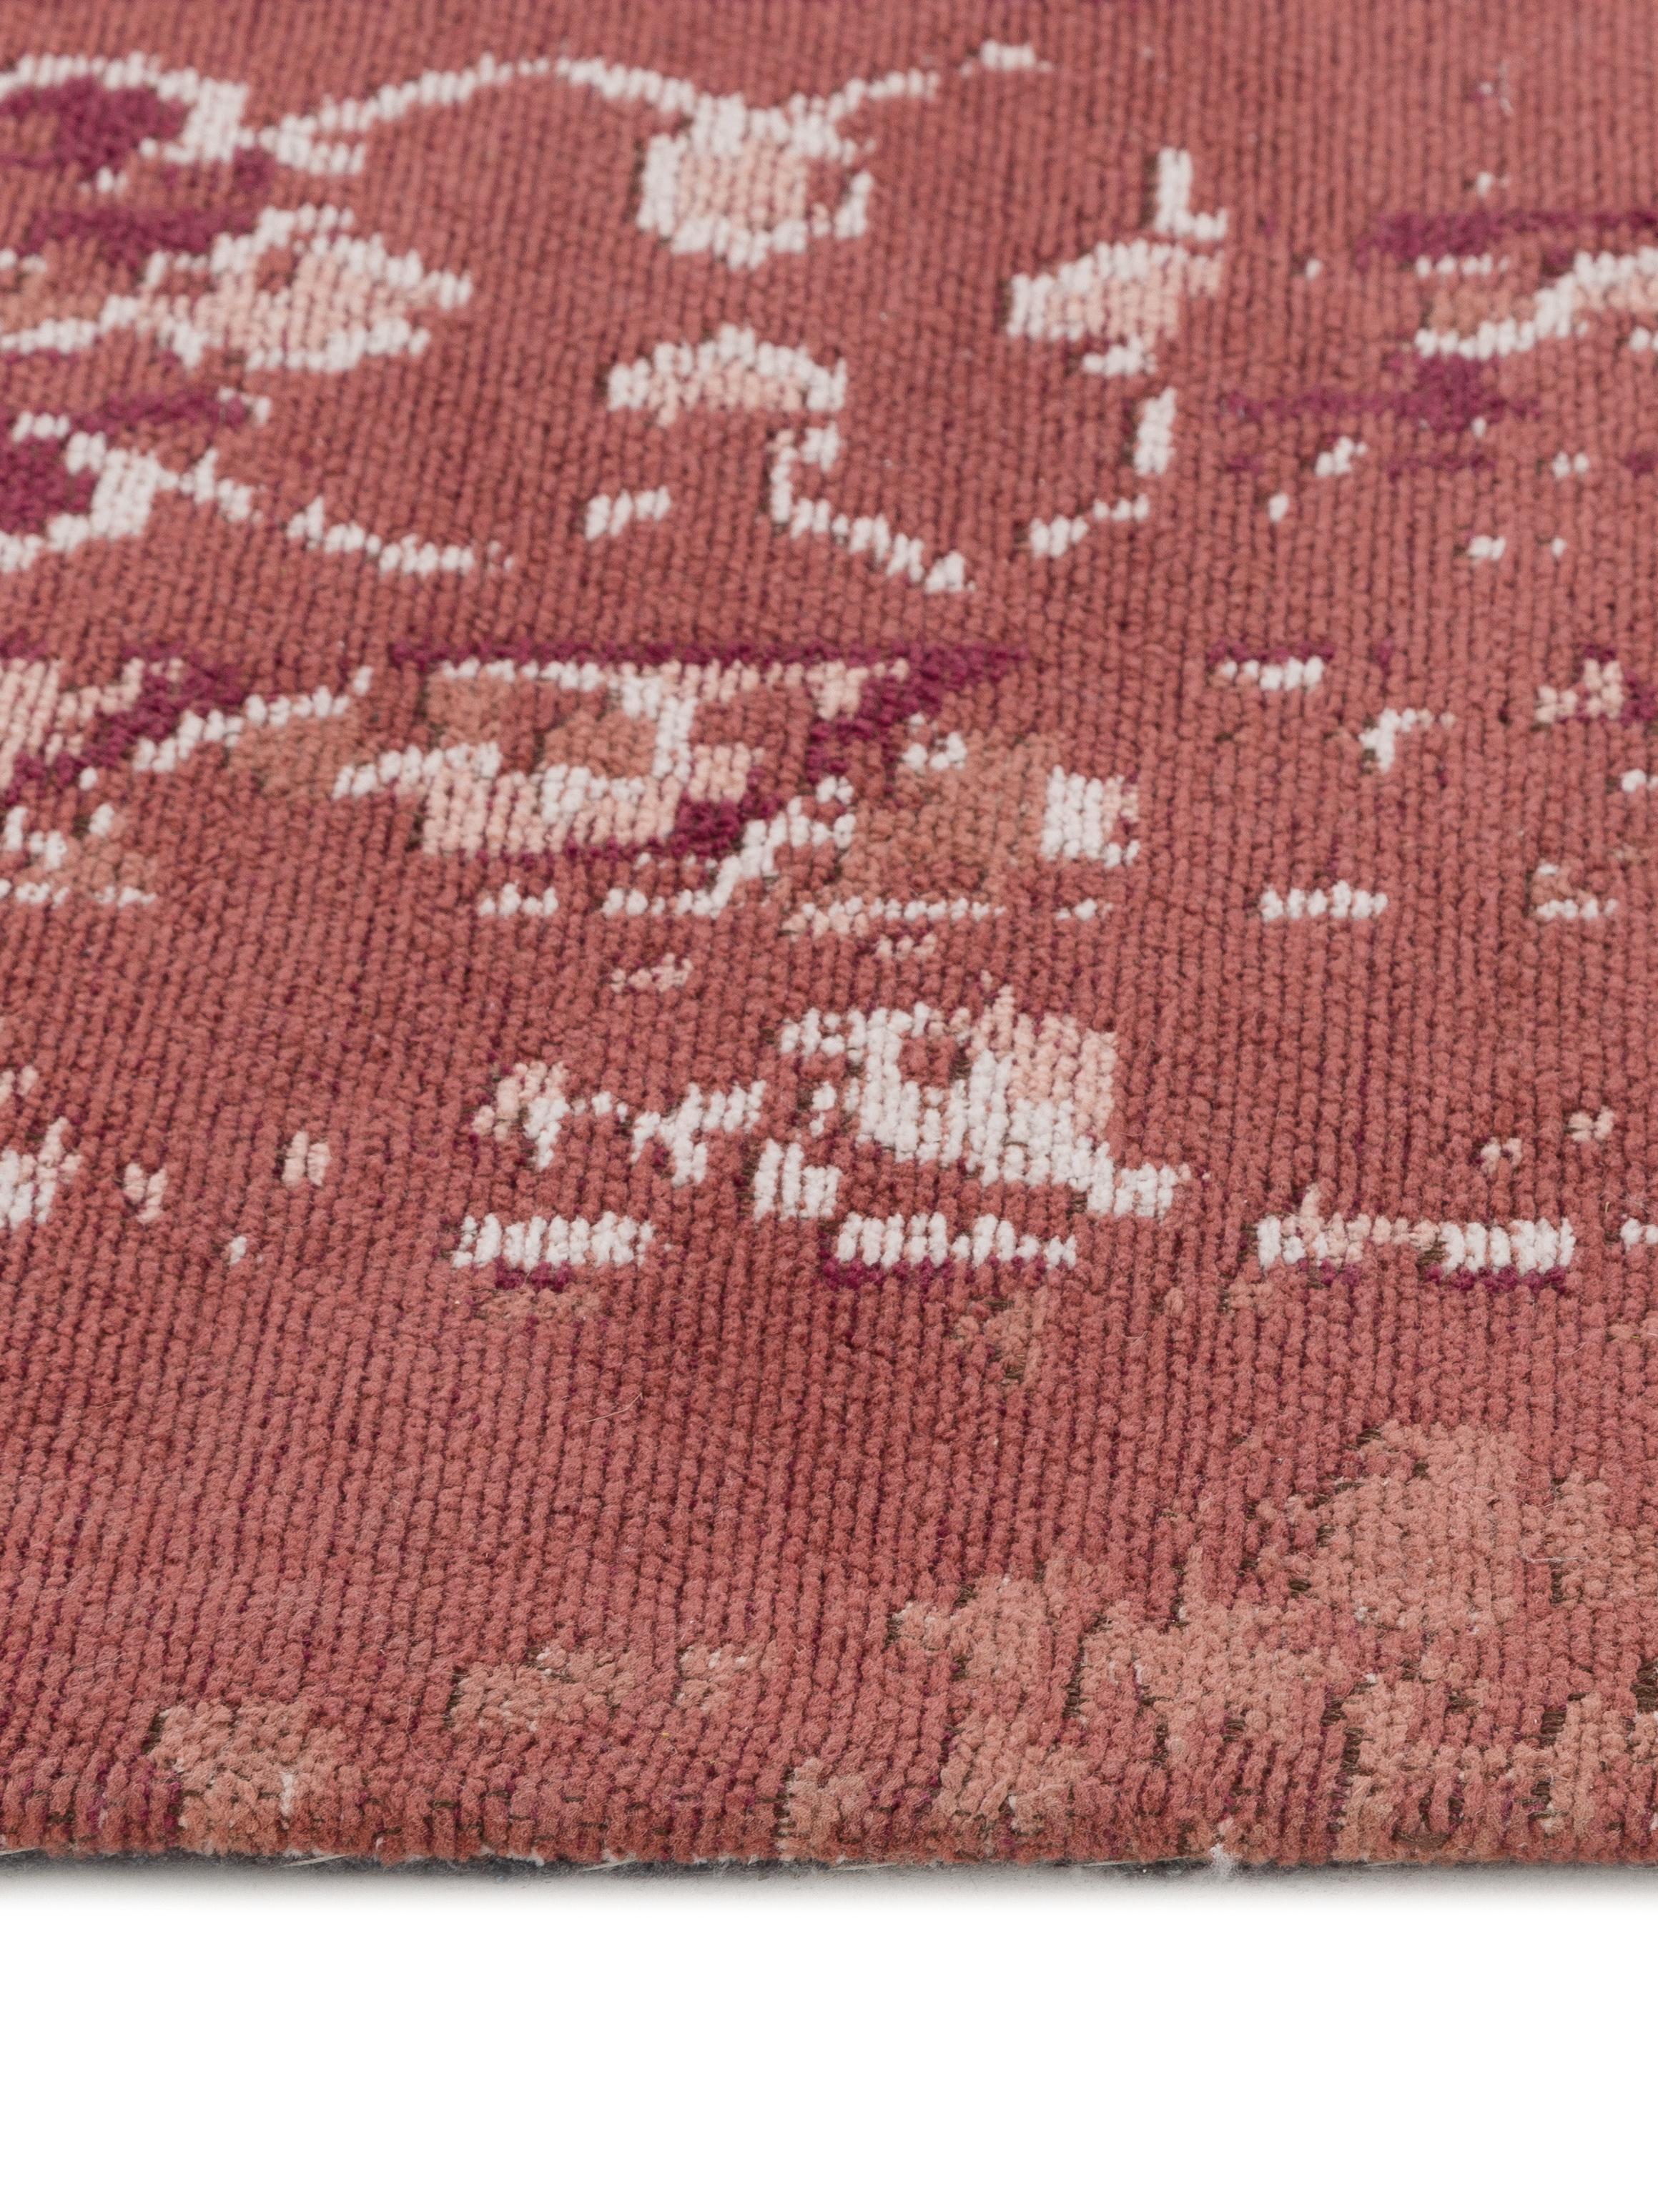 Alfombra artesanal de chenilla Rebel, estilo vintage, Parte superior: 95%algodón, 5%poliéster, Reverso: 100%algodón, Rojo cobrizo, crema, rojo, An 120 x L 180  cm(Tamaño S)